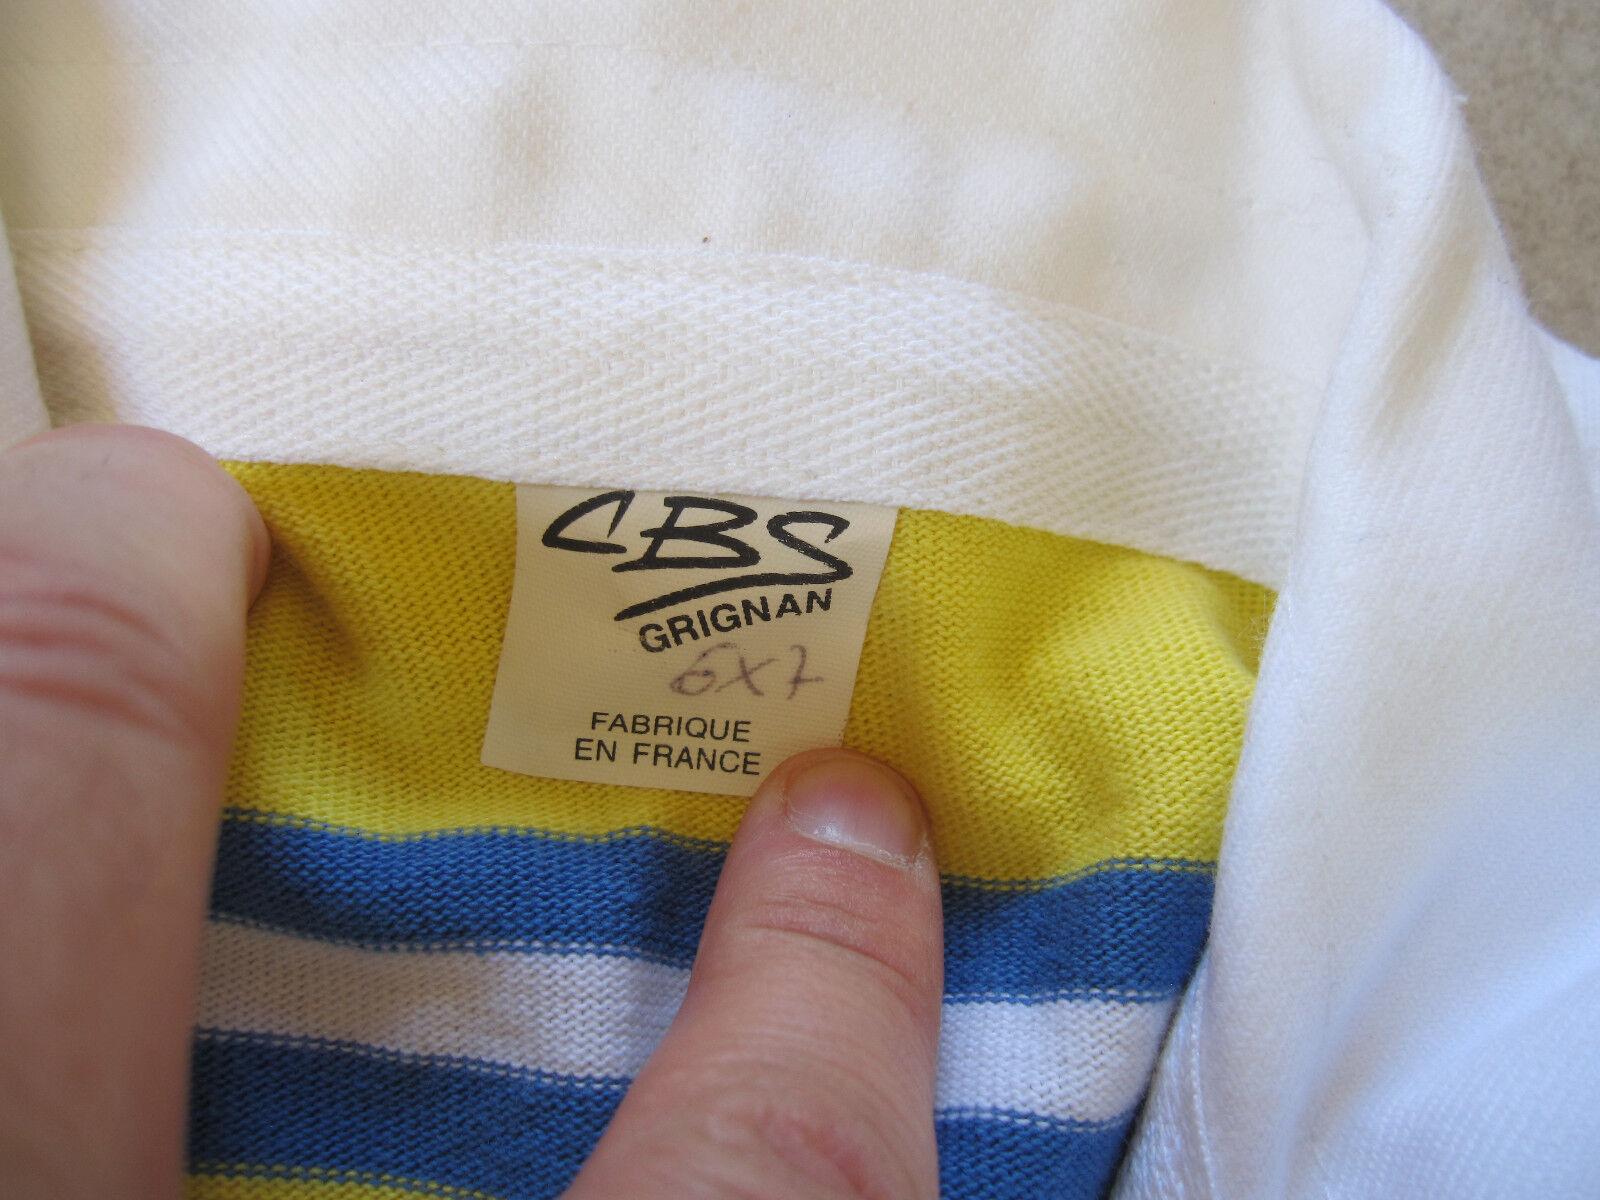 Maillot Vintage rugby Club Hyerois RCH Hyeres CBS Vintage Maillot Jersey - XL b7da3e